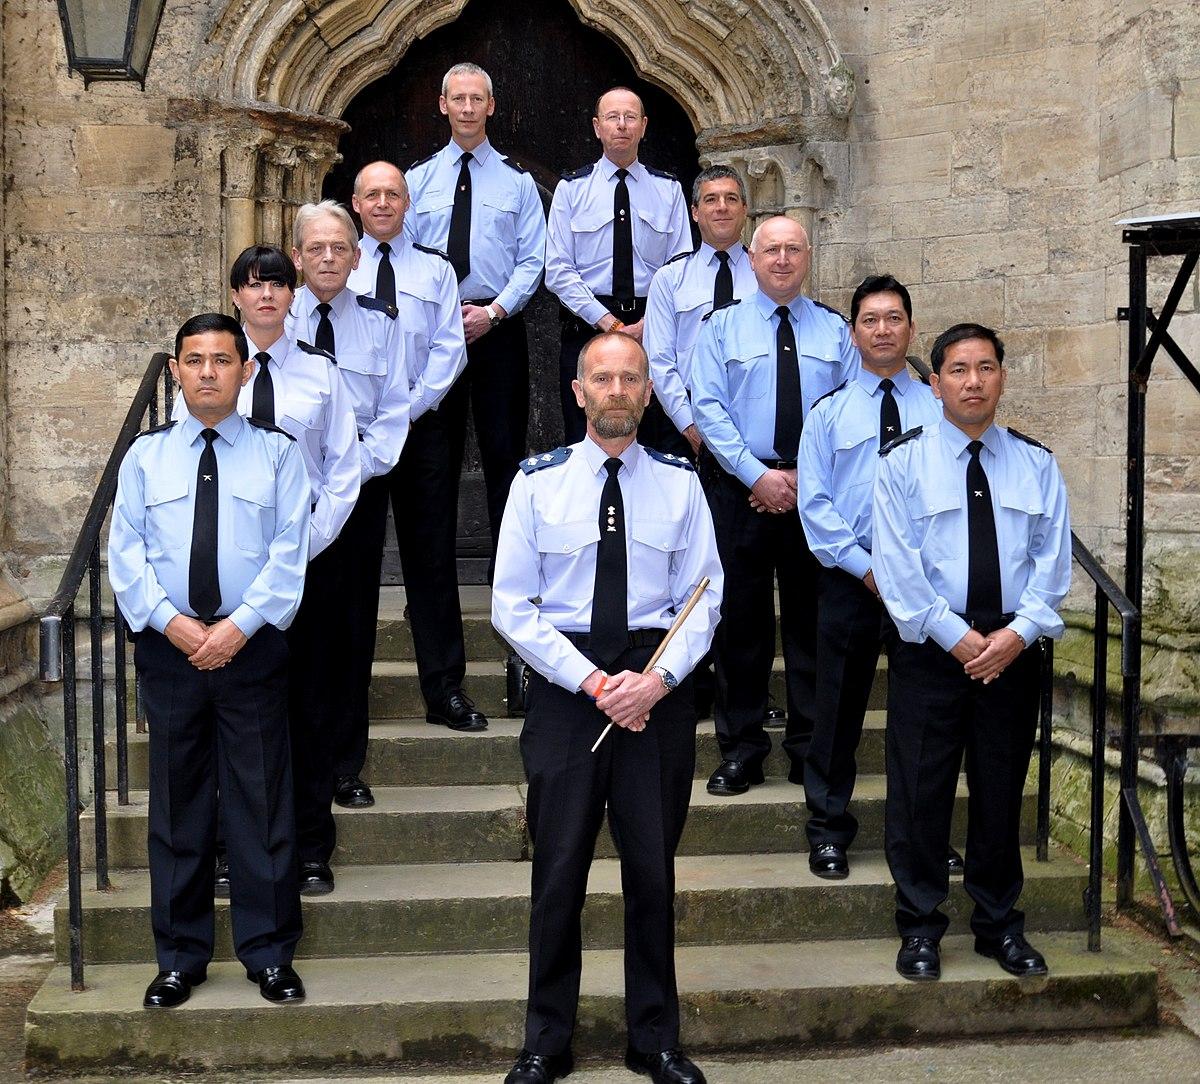 York Minster Police Wikipedia